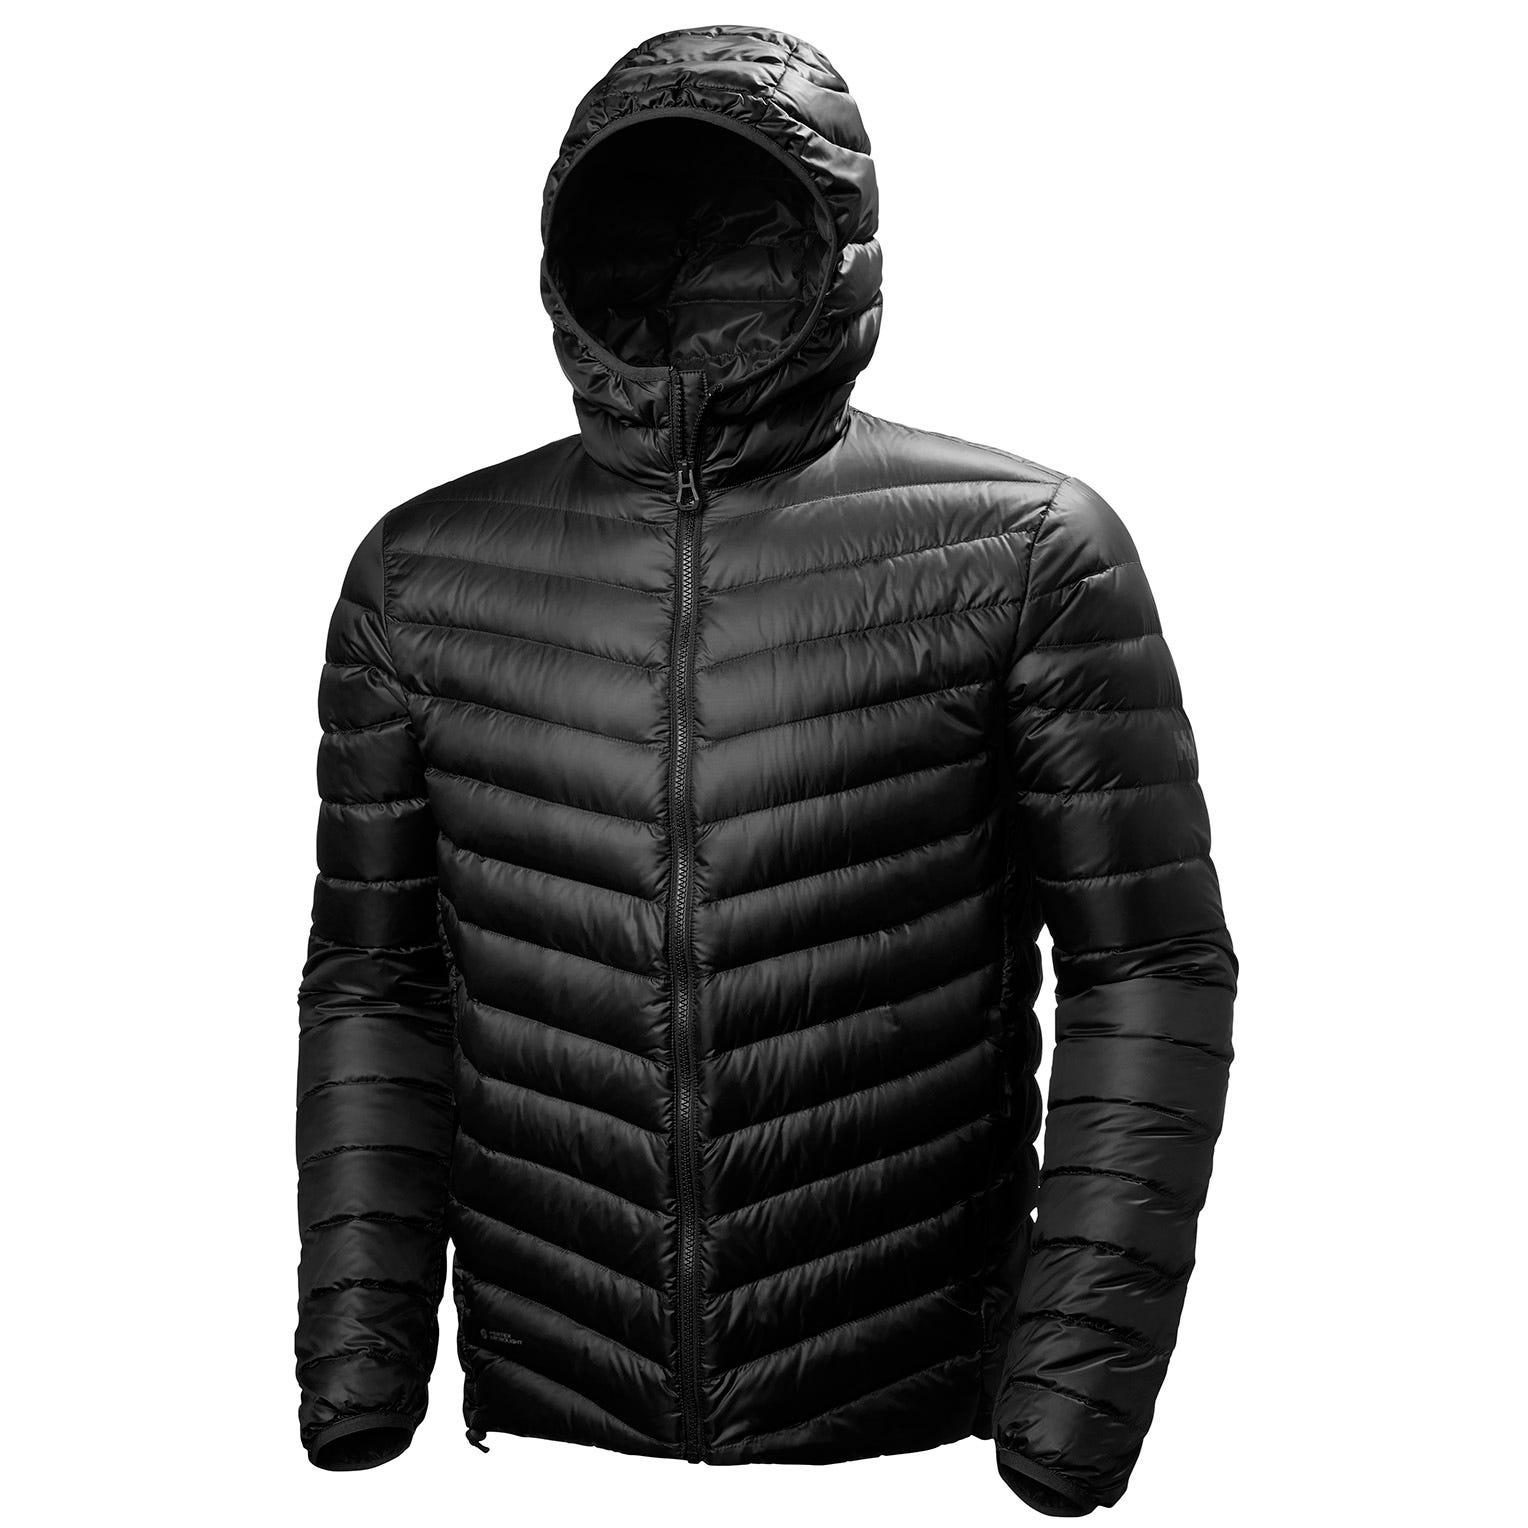 Helly Hansen Verglas Hooded Down Insulator Mens Hiking Jacket Black S